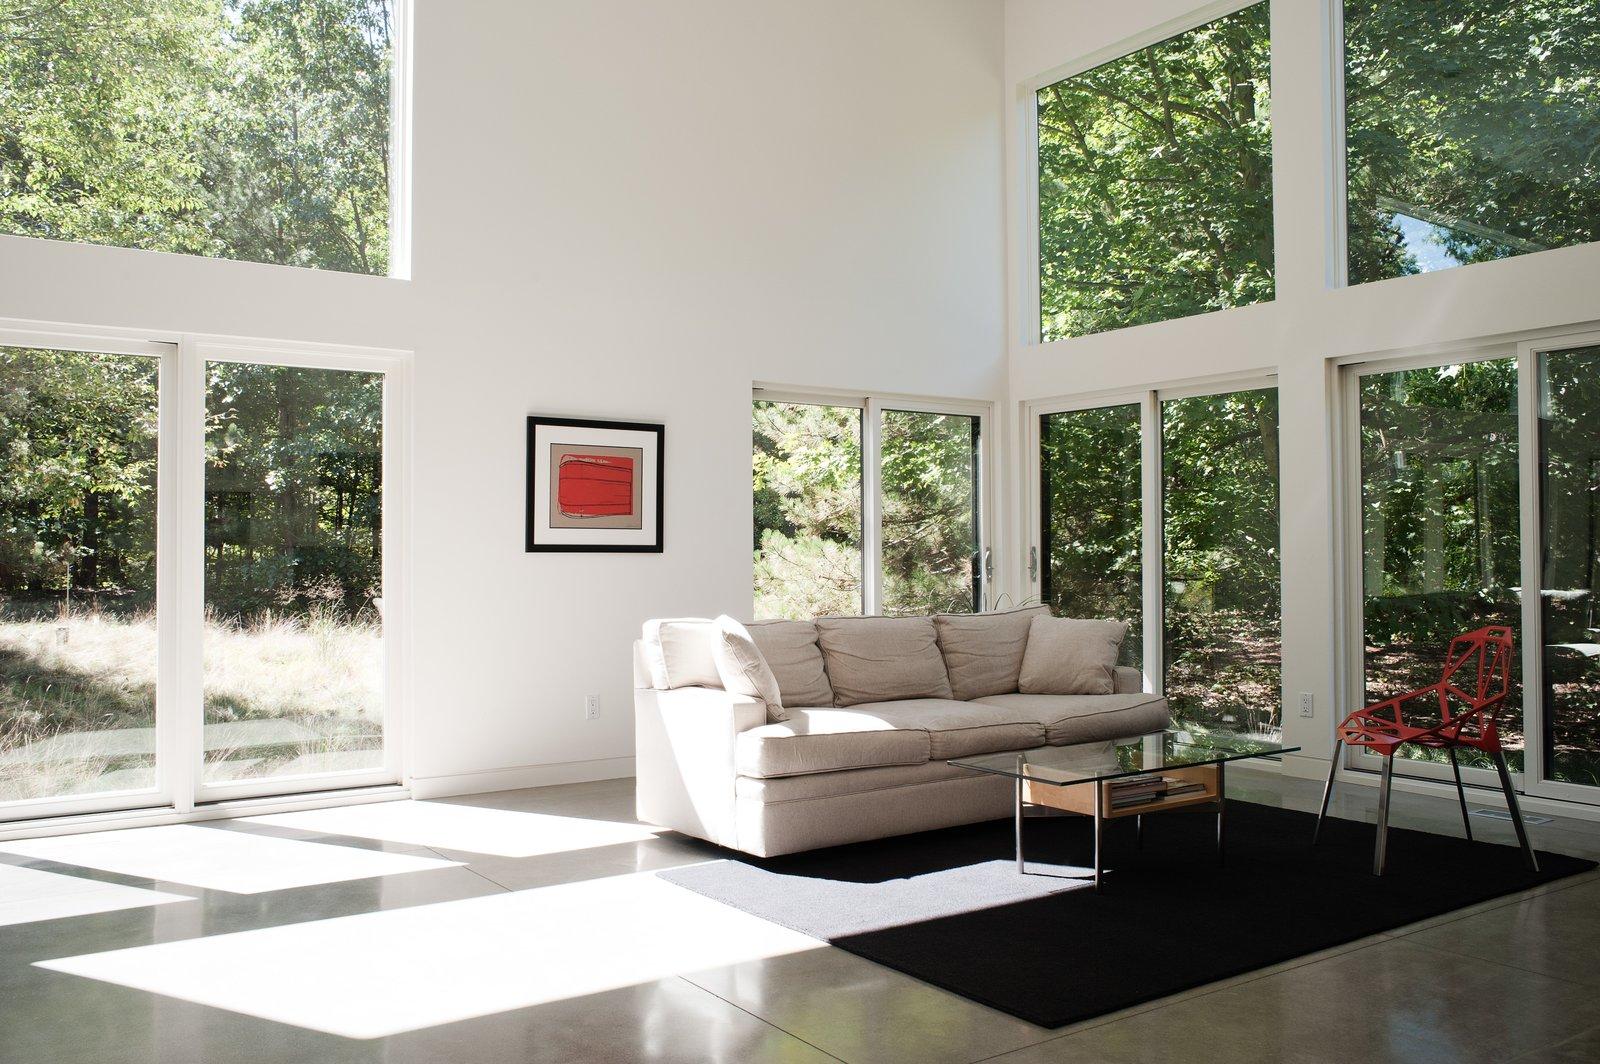 Laketown Residence by Wilkens Design Studio